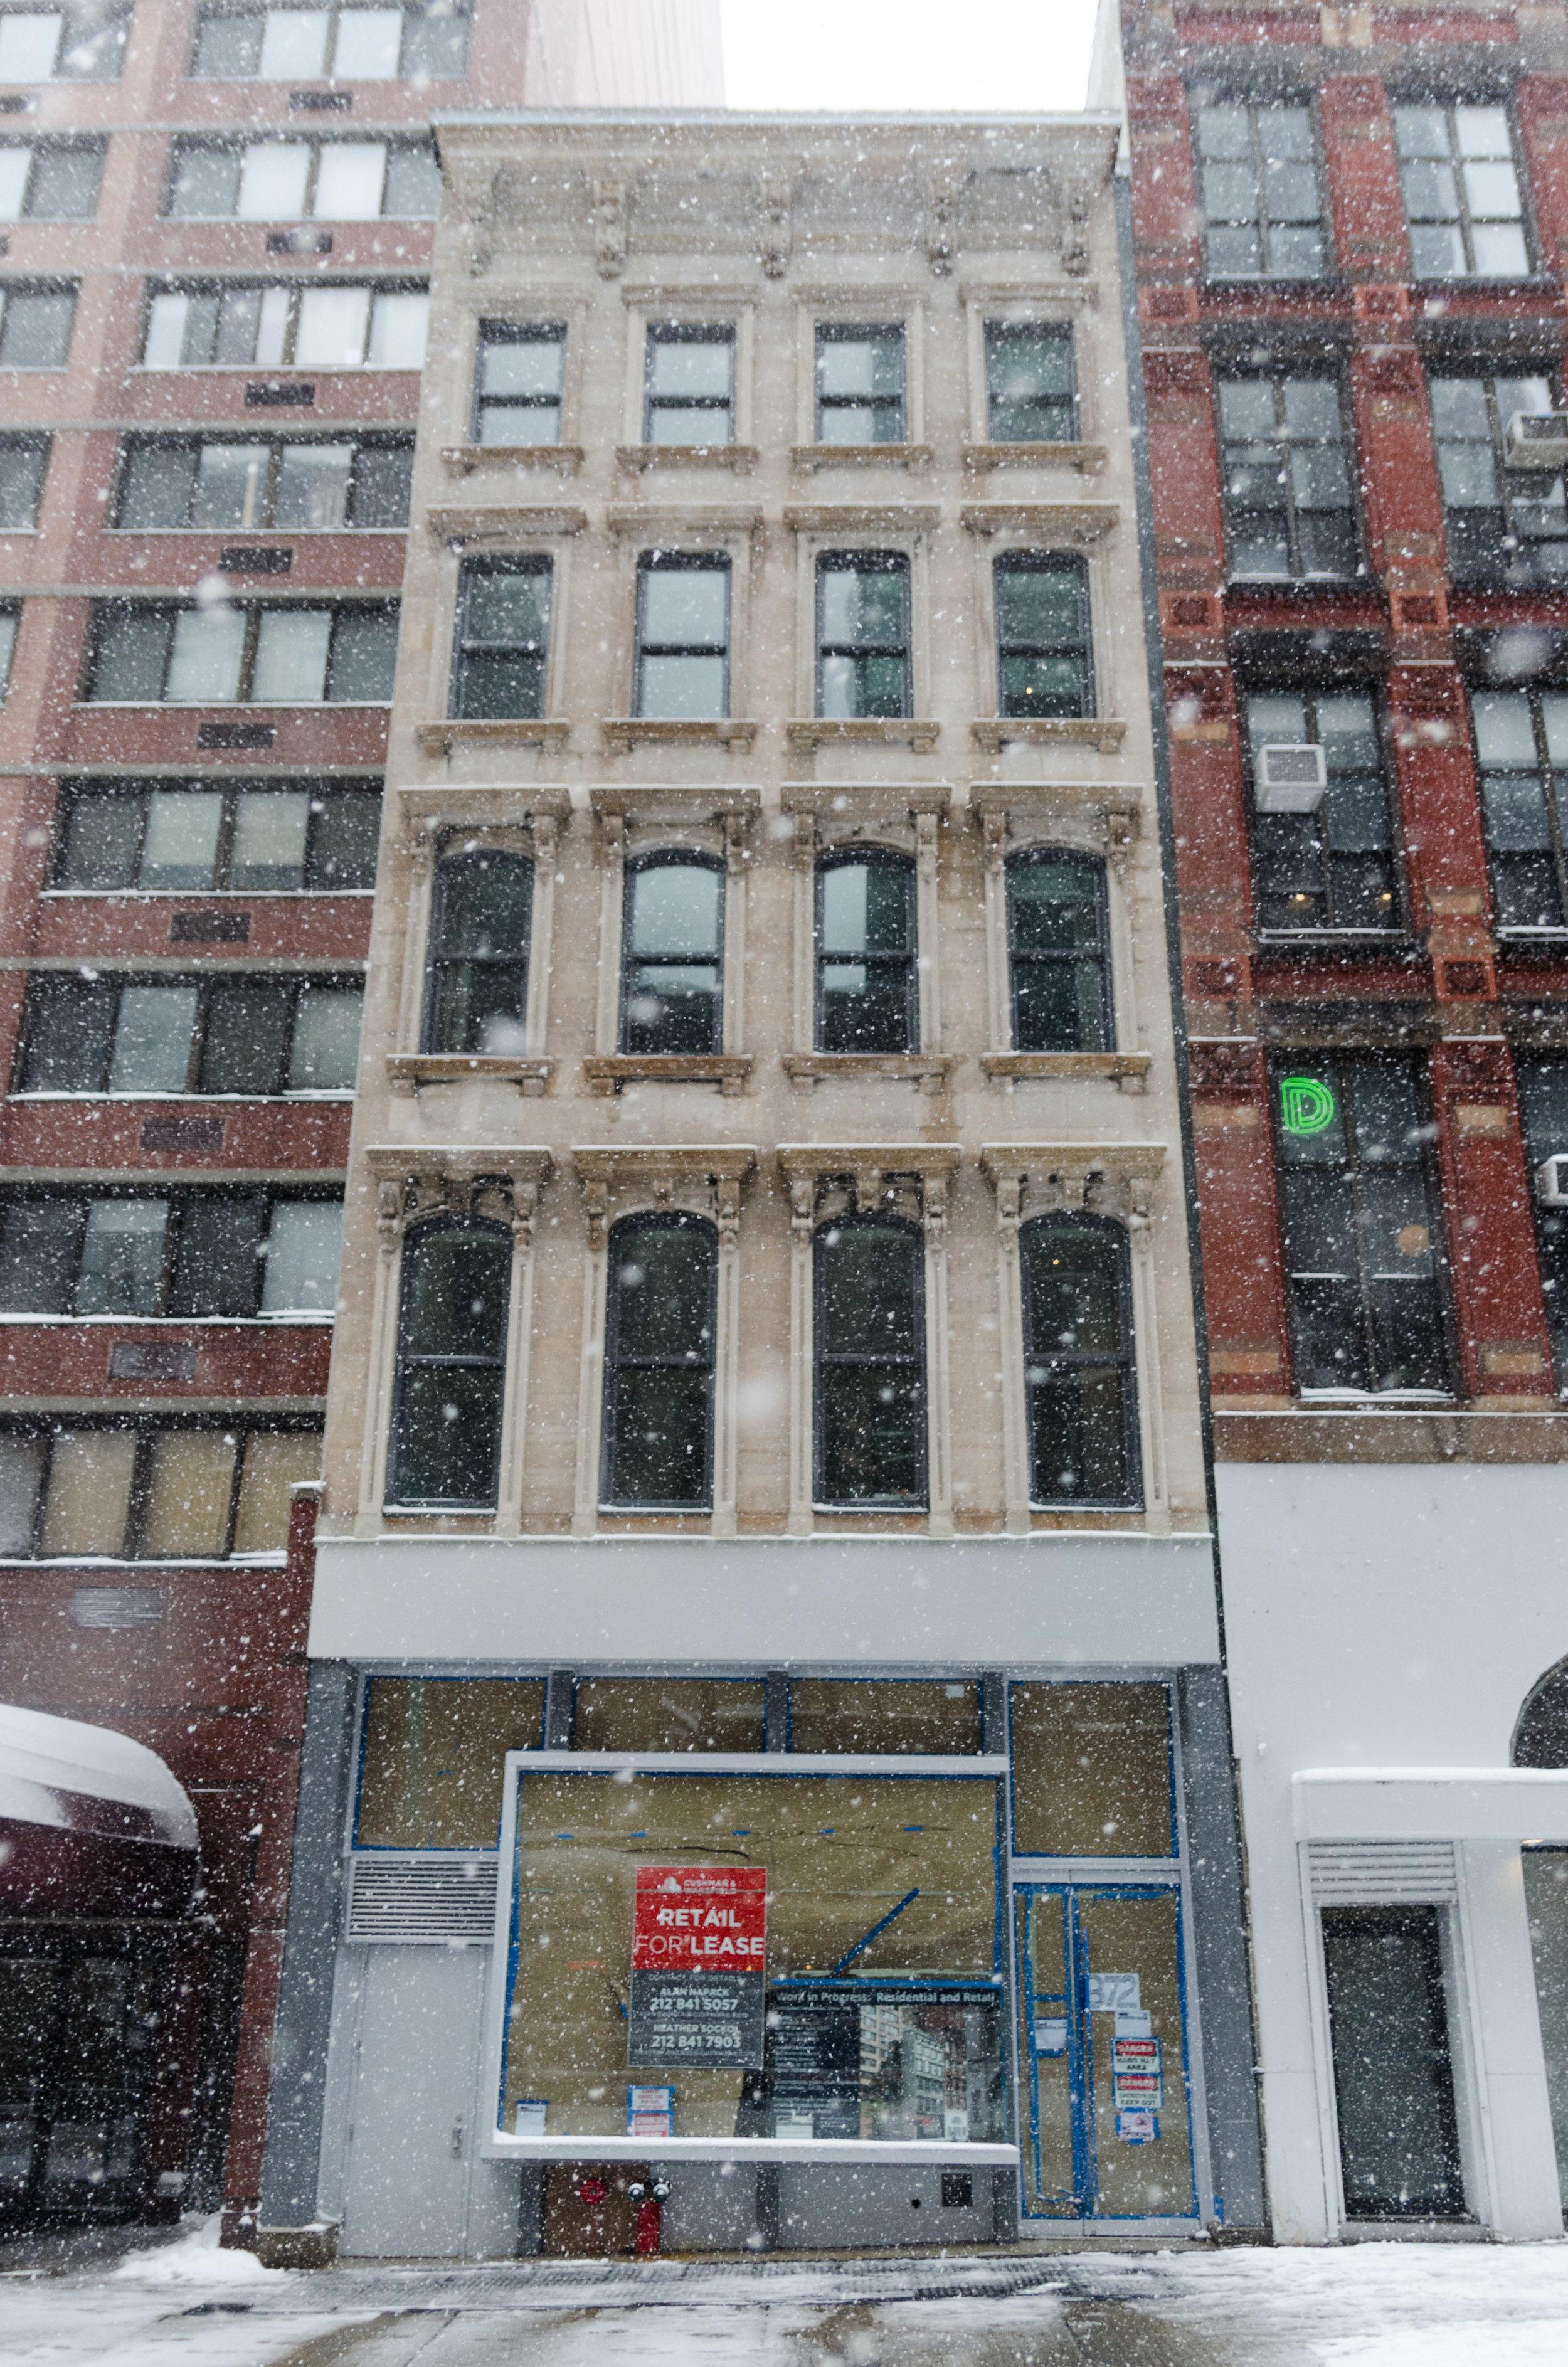 2017-02-09 - Snowstorm-9.jpg